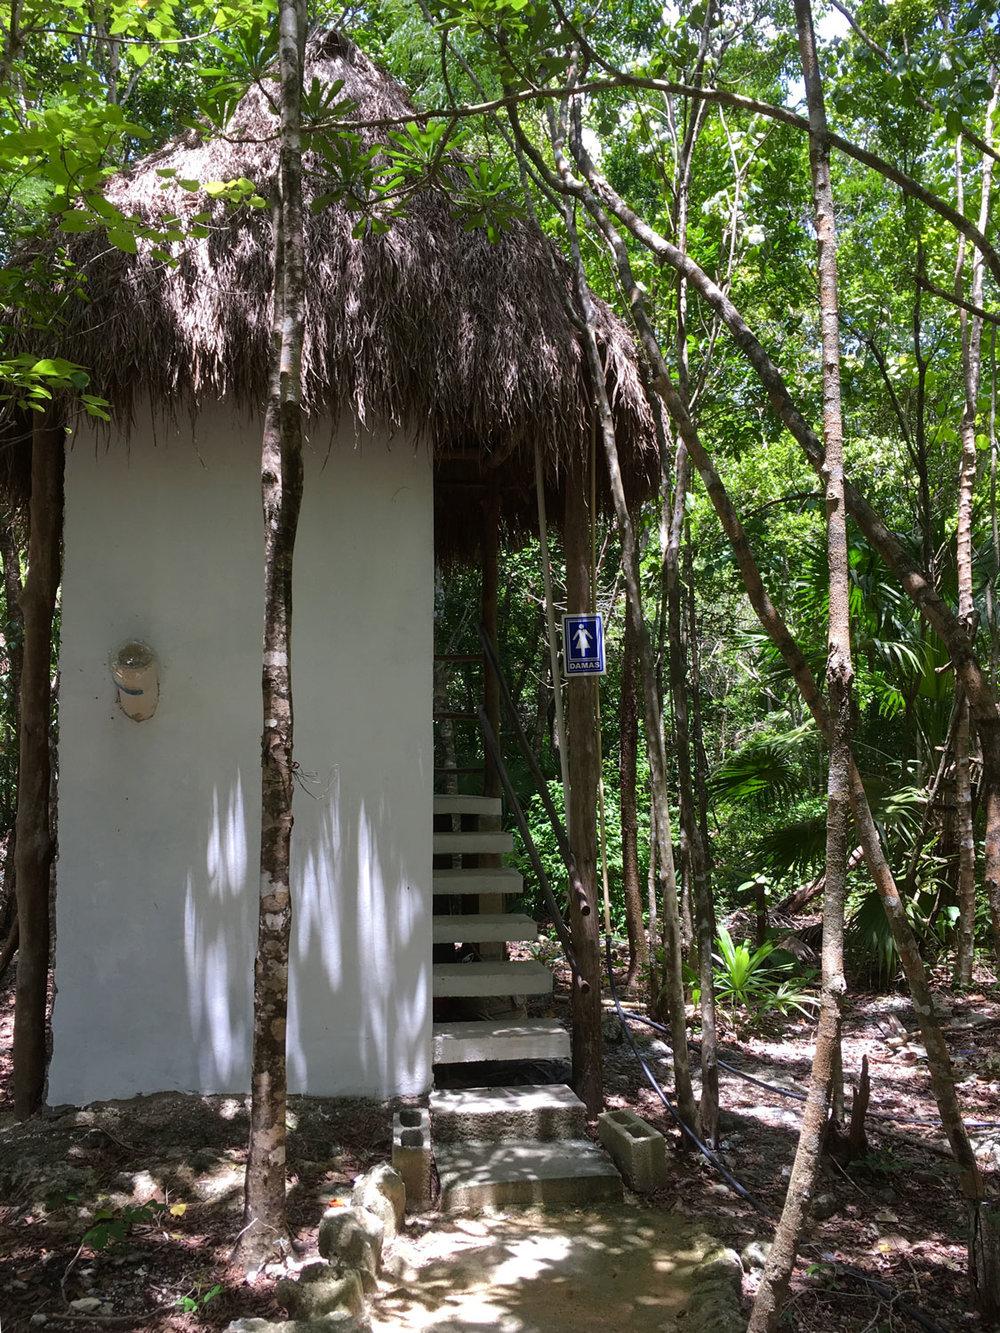 Rustic bathrooms in the jungle.